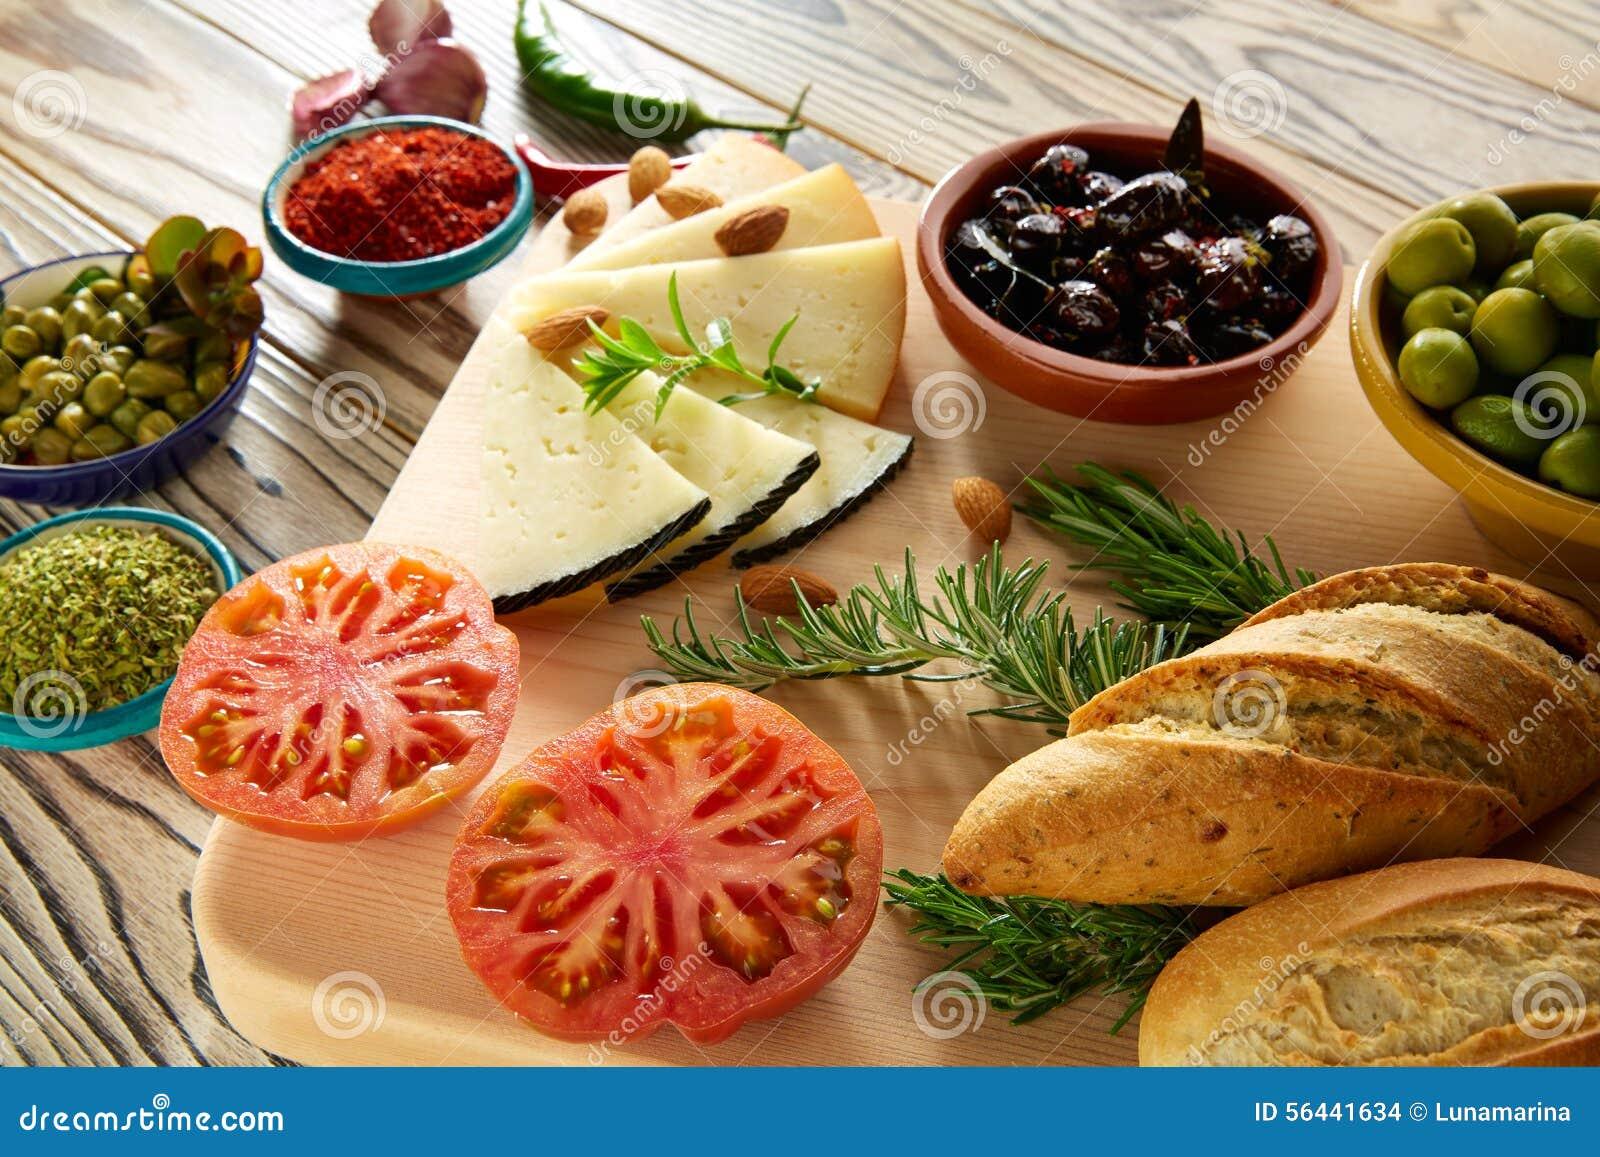 Image result for mediterranean food - bread